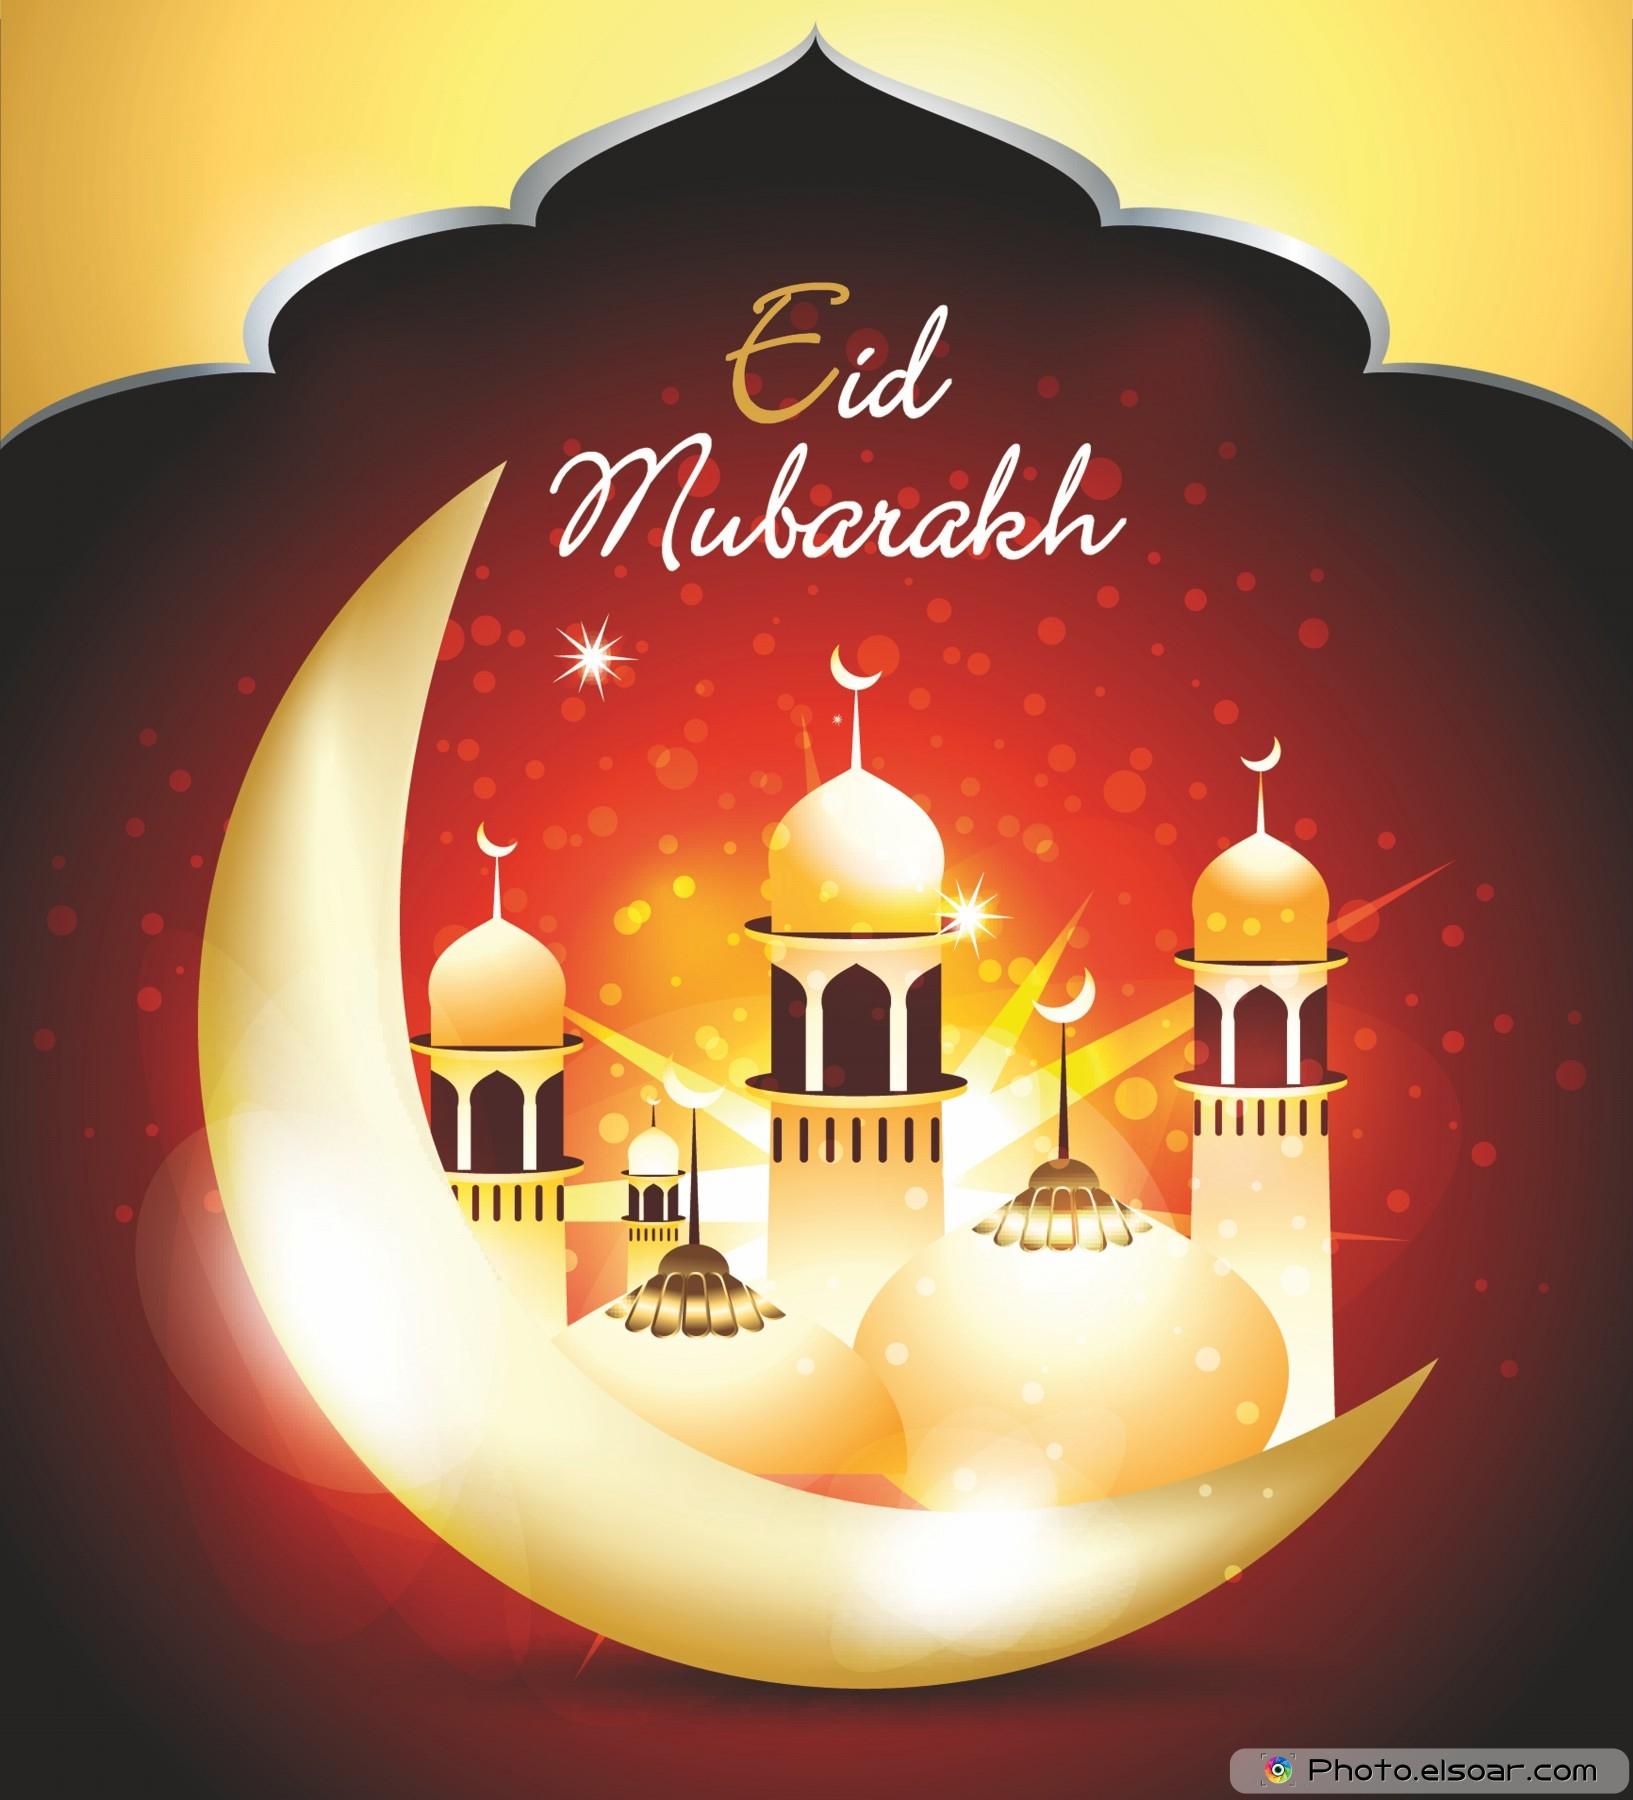 Hd wallpaper eid mubarak - Eid Mubarak Islamic Hd Wallpaper